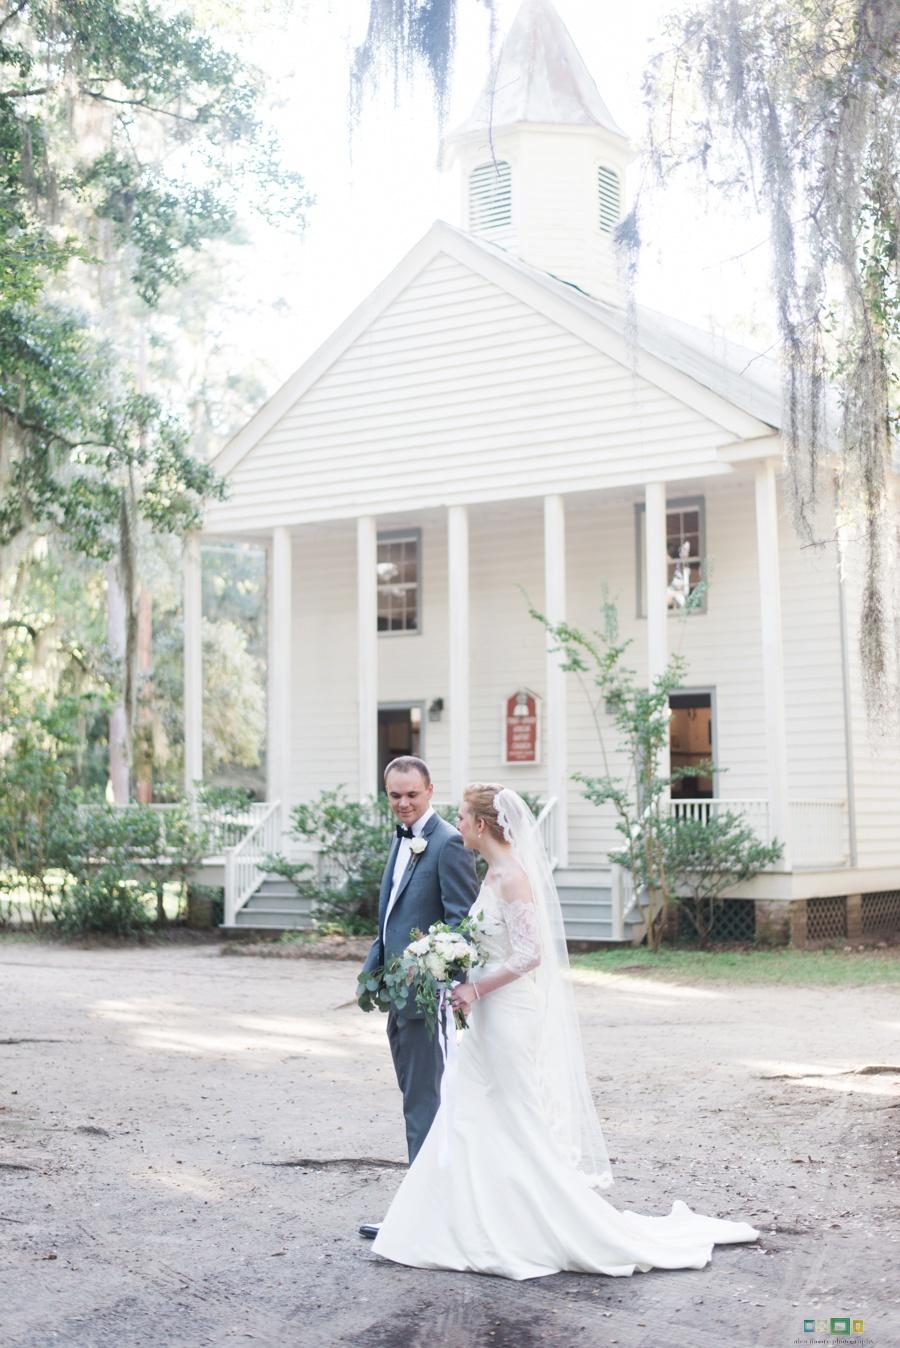 alea-moore-photography-Daufuskie-Island-wedding-ivory-and-beau-bridal-boutique-dakota-nicole-miller-rebecca-schoneveld-marisol-classic-southern-wedding-savannah-wedding-dresses-savannah-bridal-boutique-savannah-weddings-savannah-bridal-gowns-14.jpg